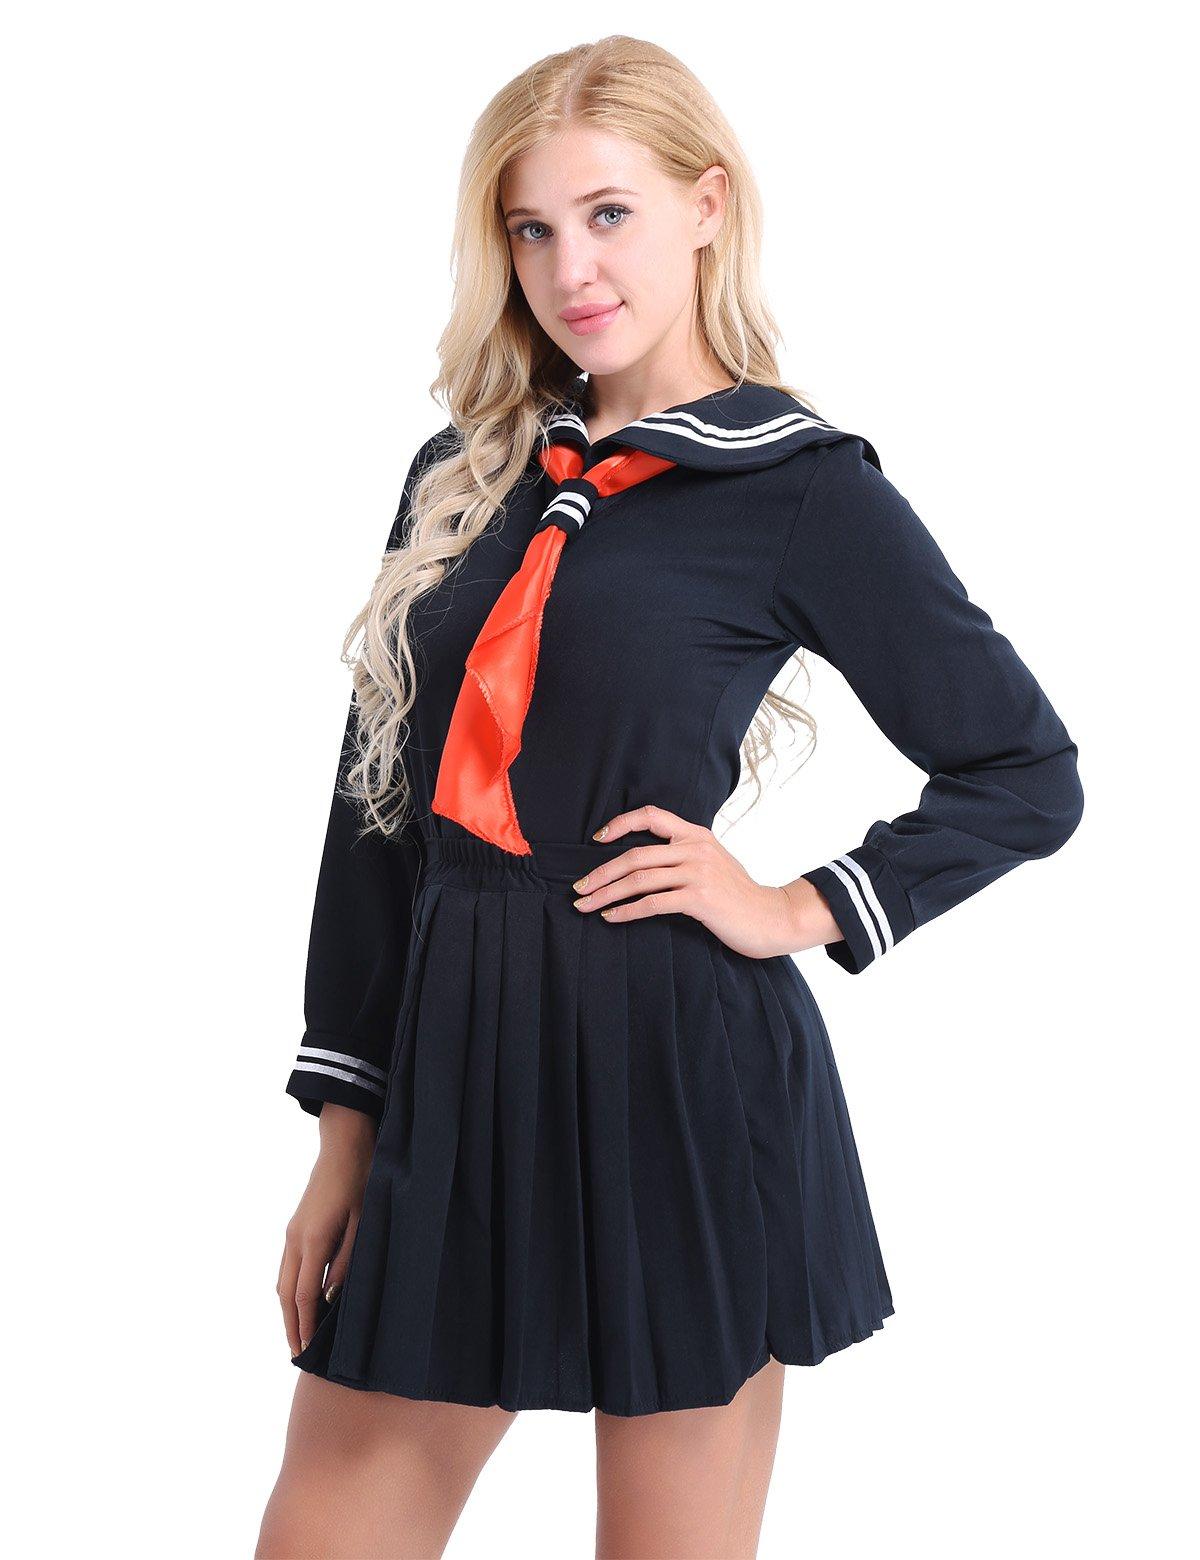 iiniim Womens Sailor School Uniform Dress Japanese Anime Lolita Sailor Suit Dark Navy S